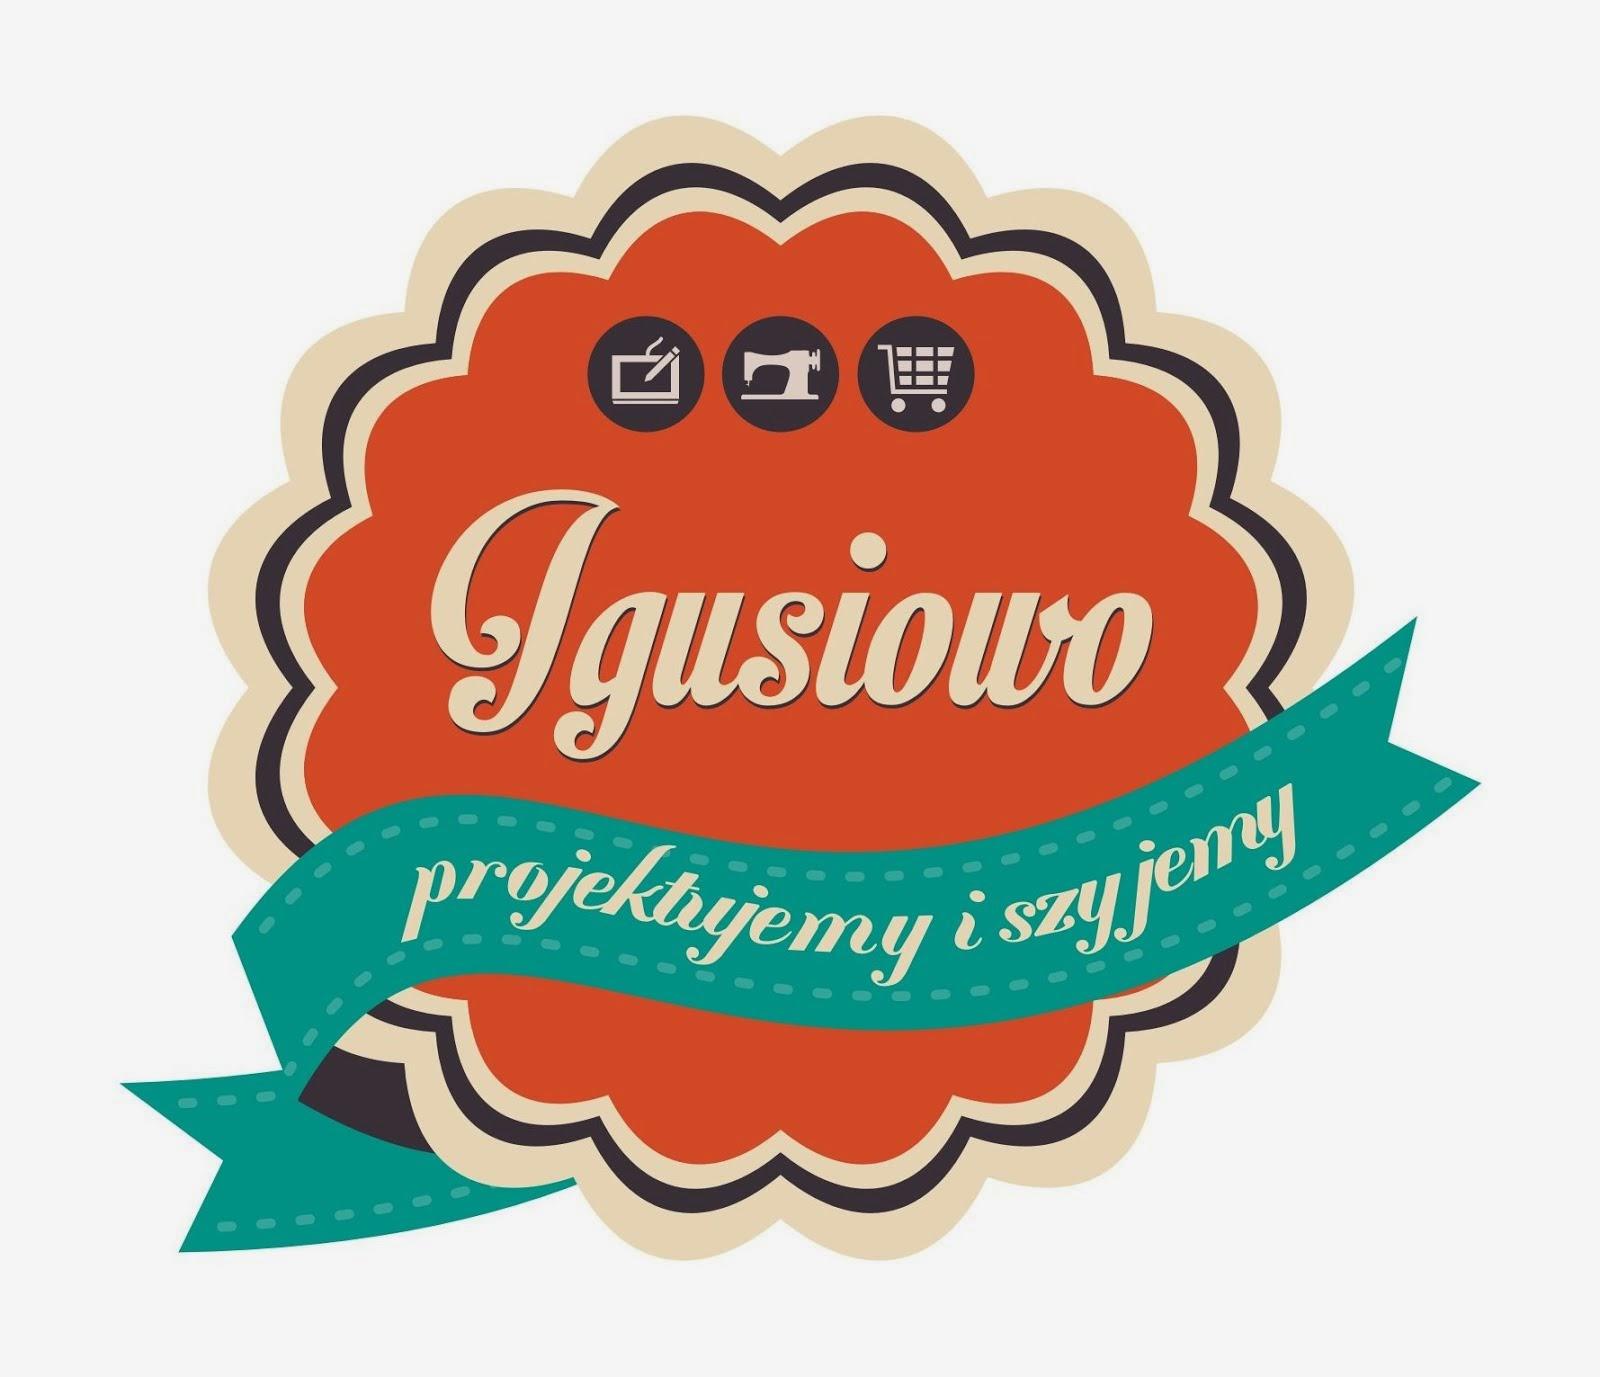 IGUSIOWO